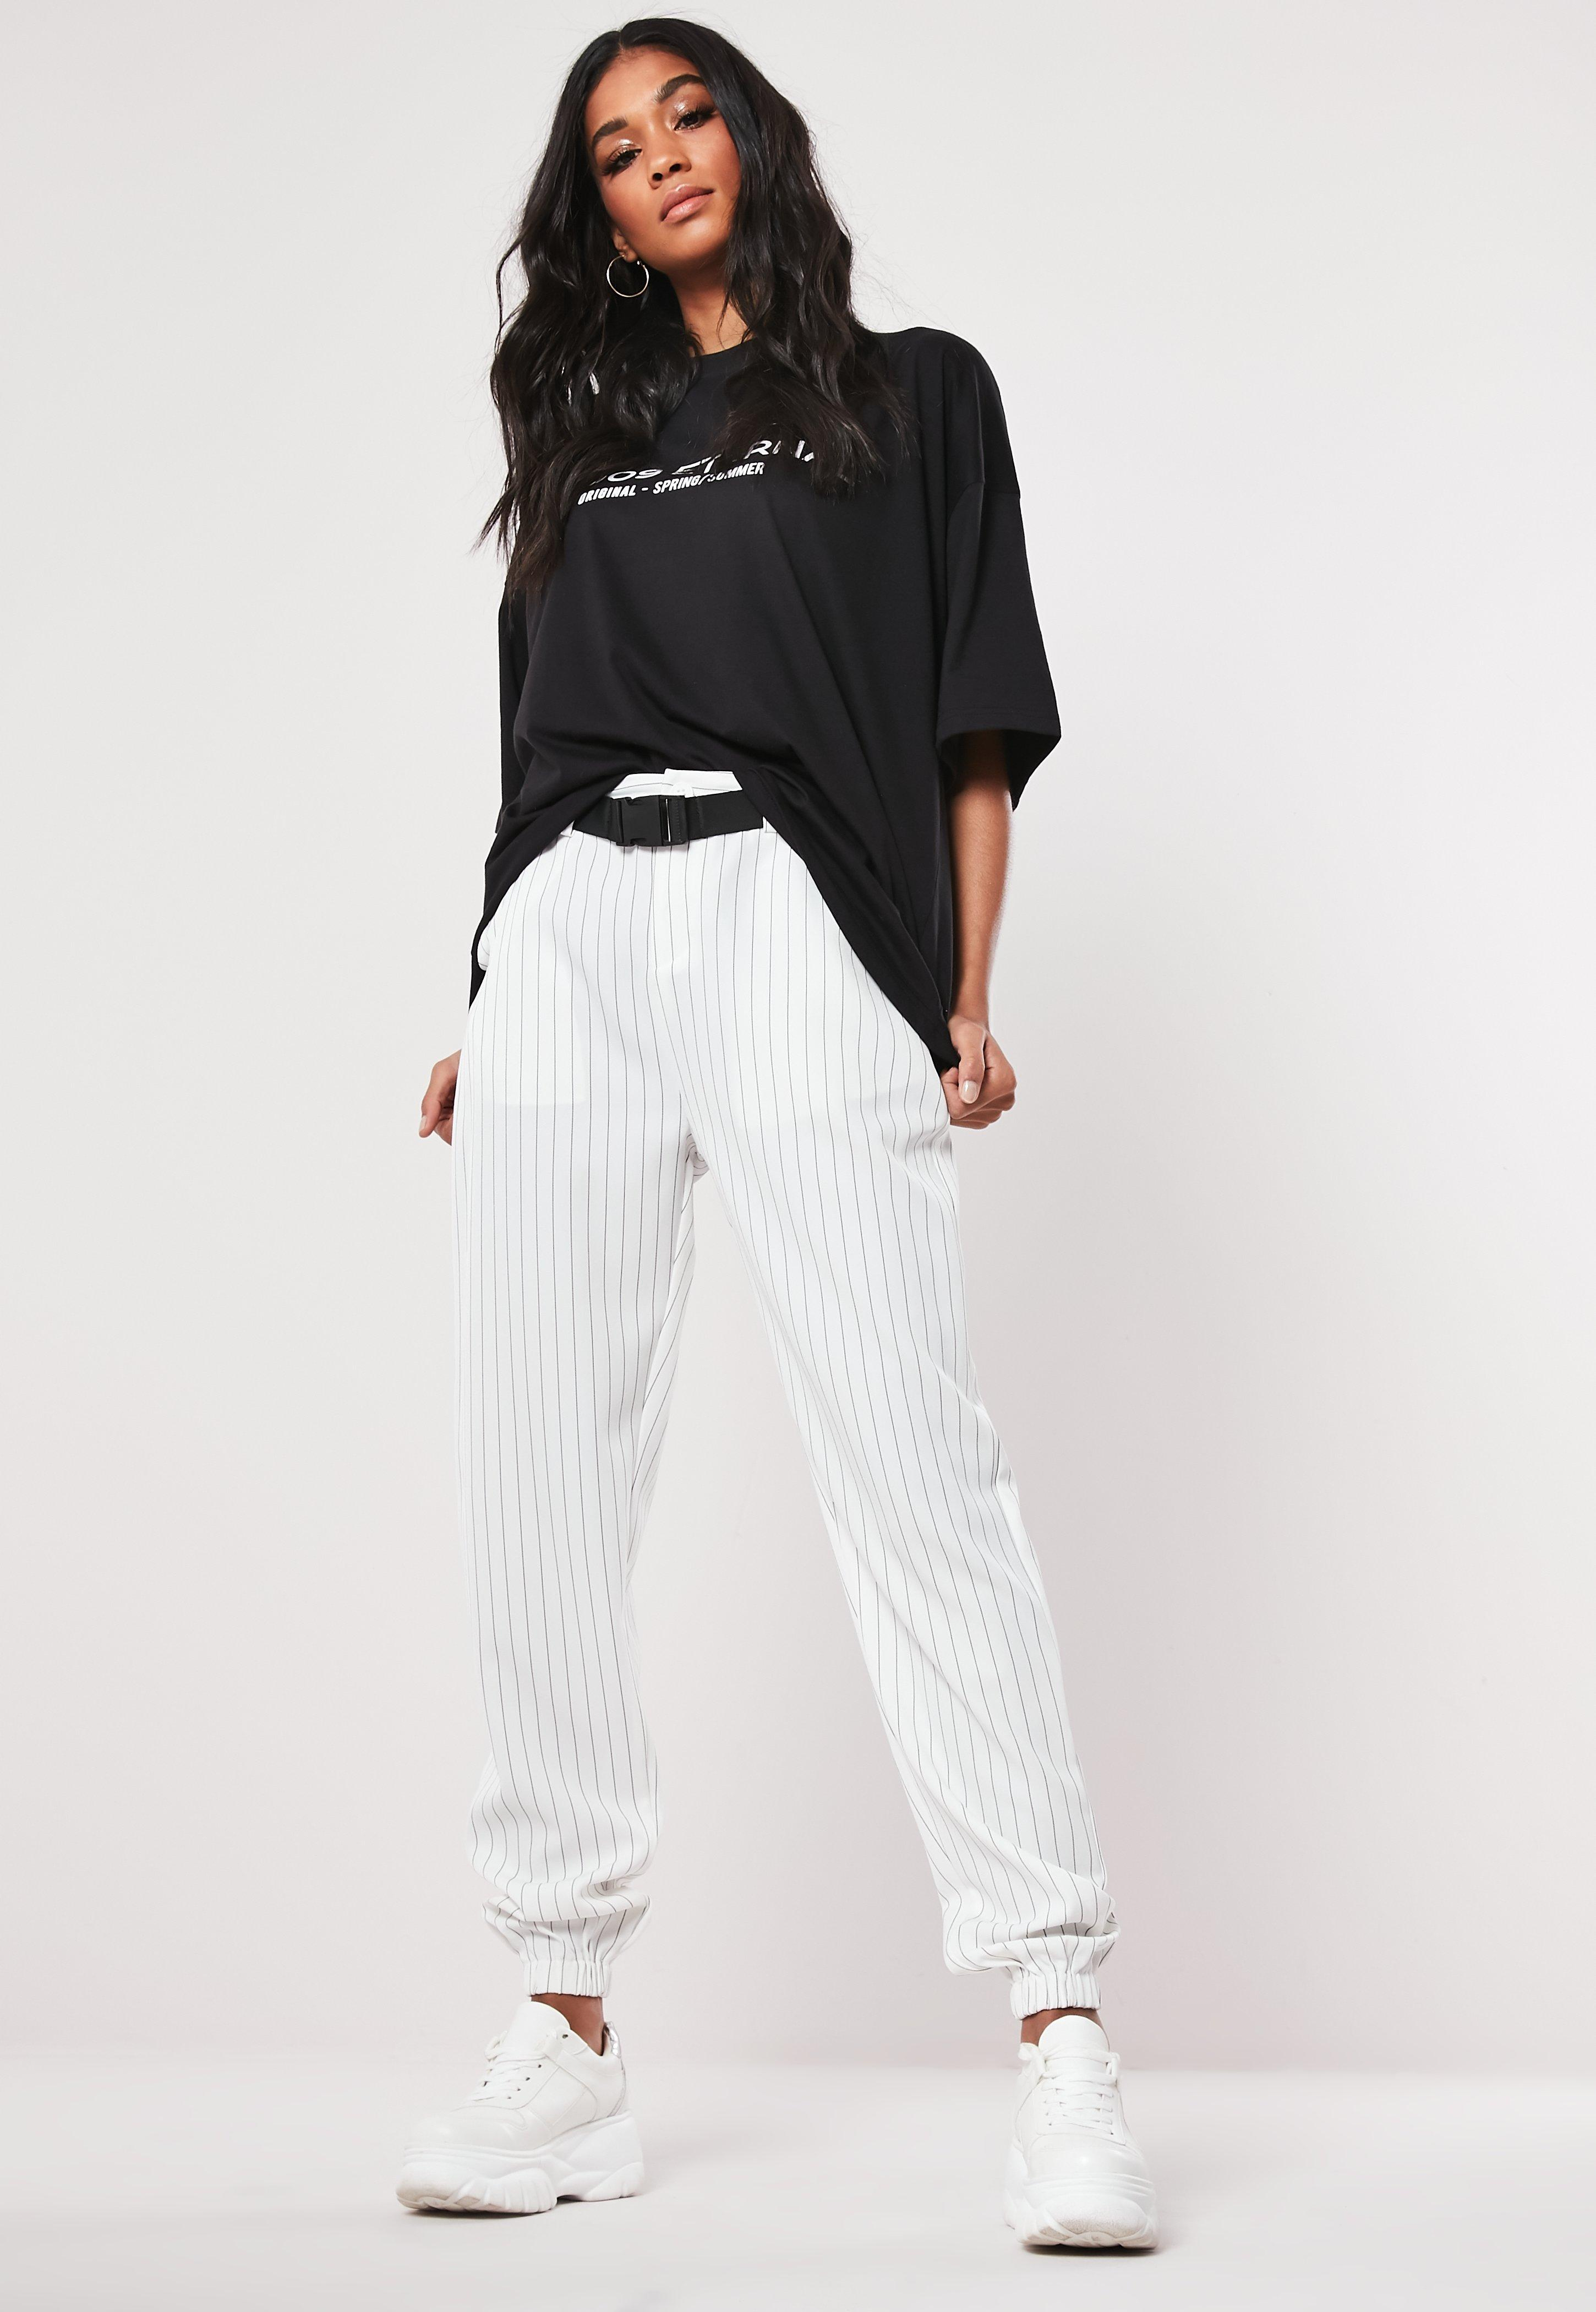 7e985f25 Missguided - Petite Black Eternal Drop Shoulder T Shirt - Lyst. View  fullscreen